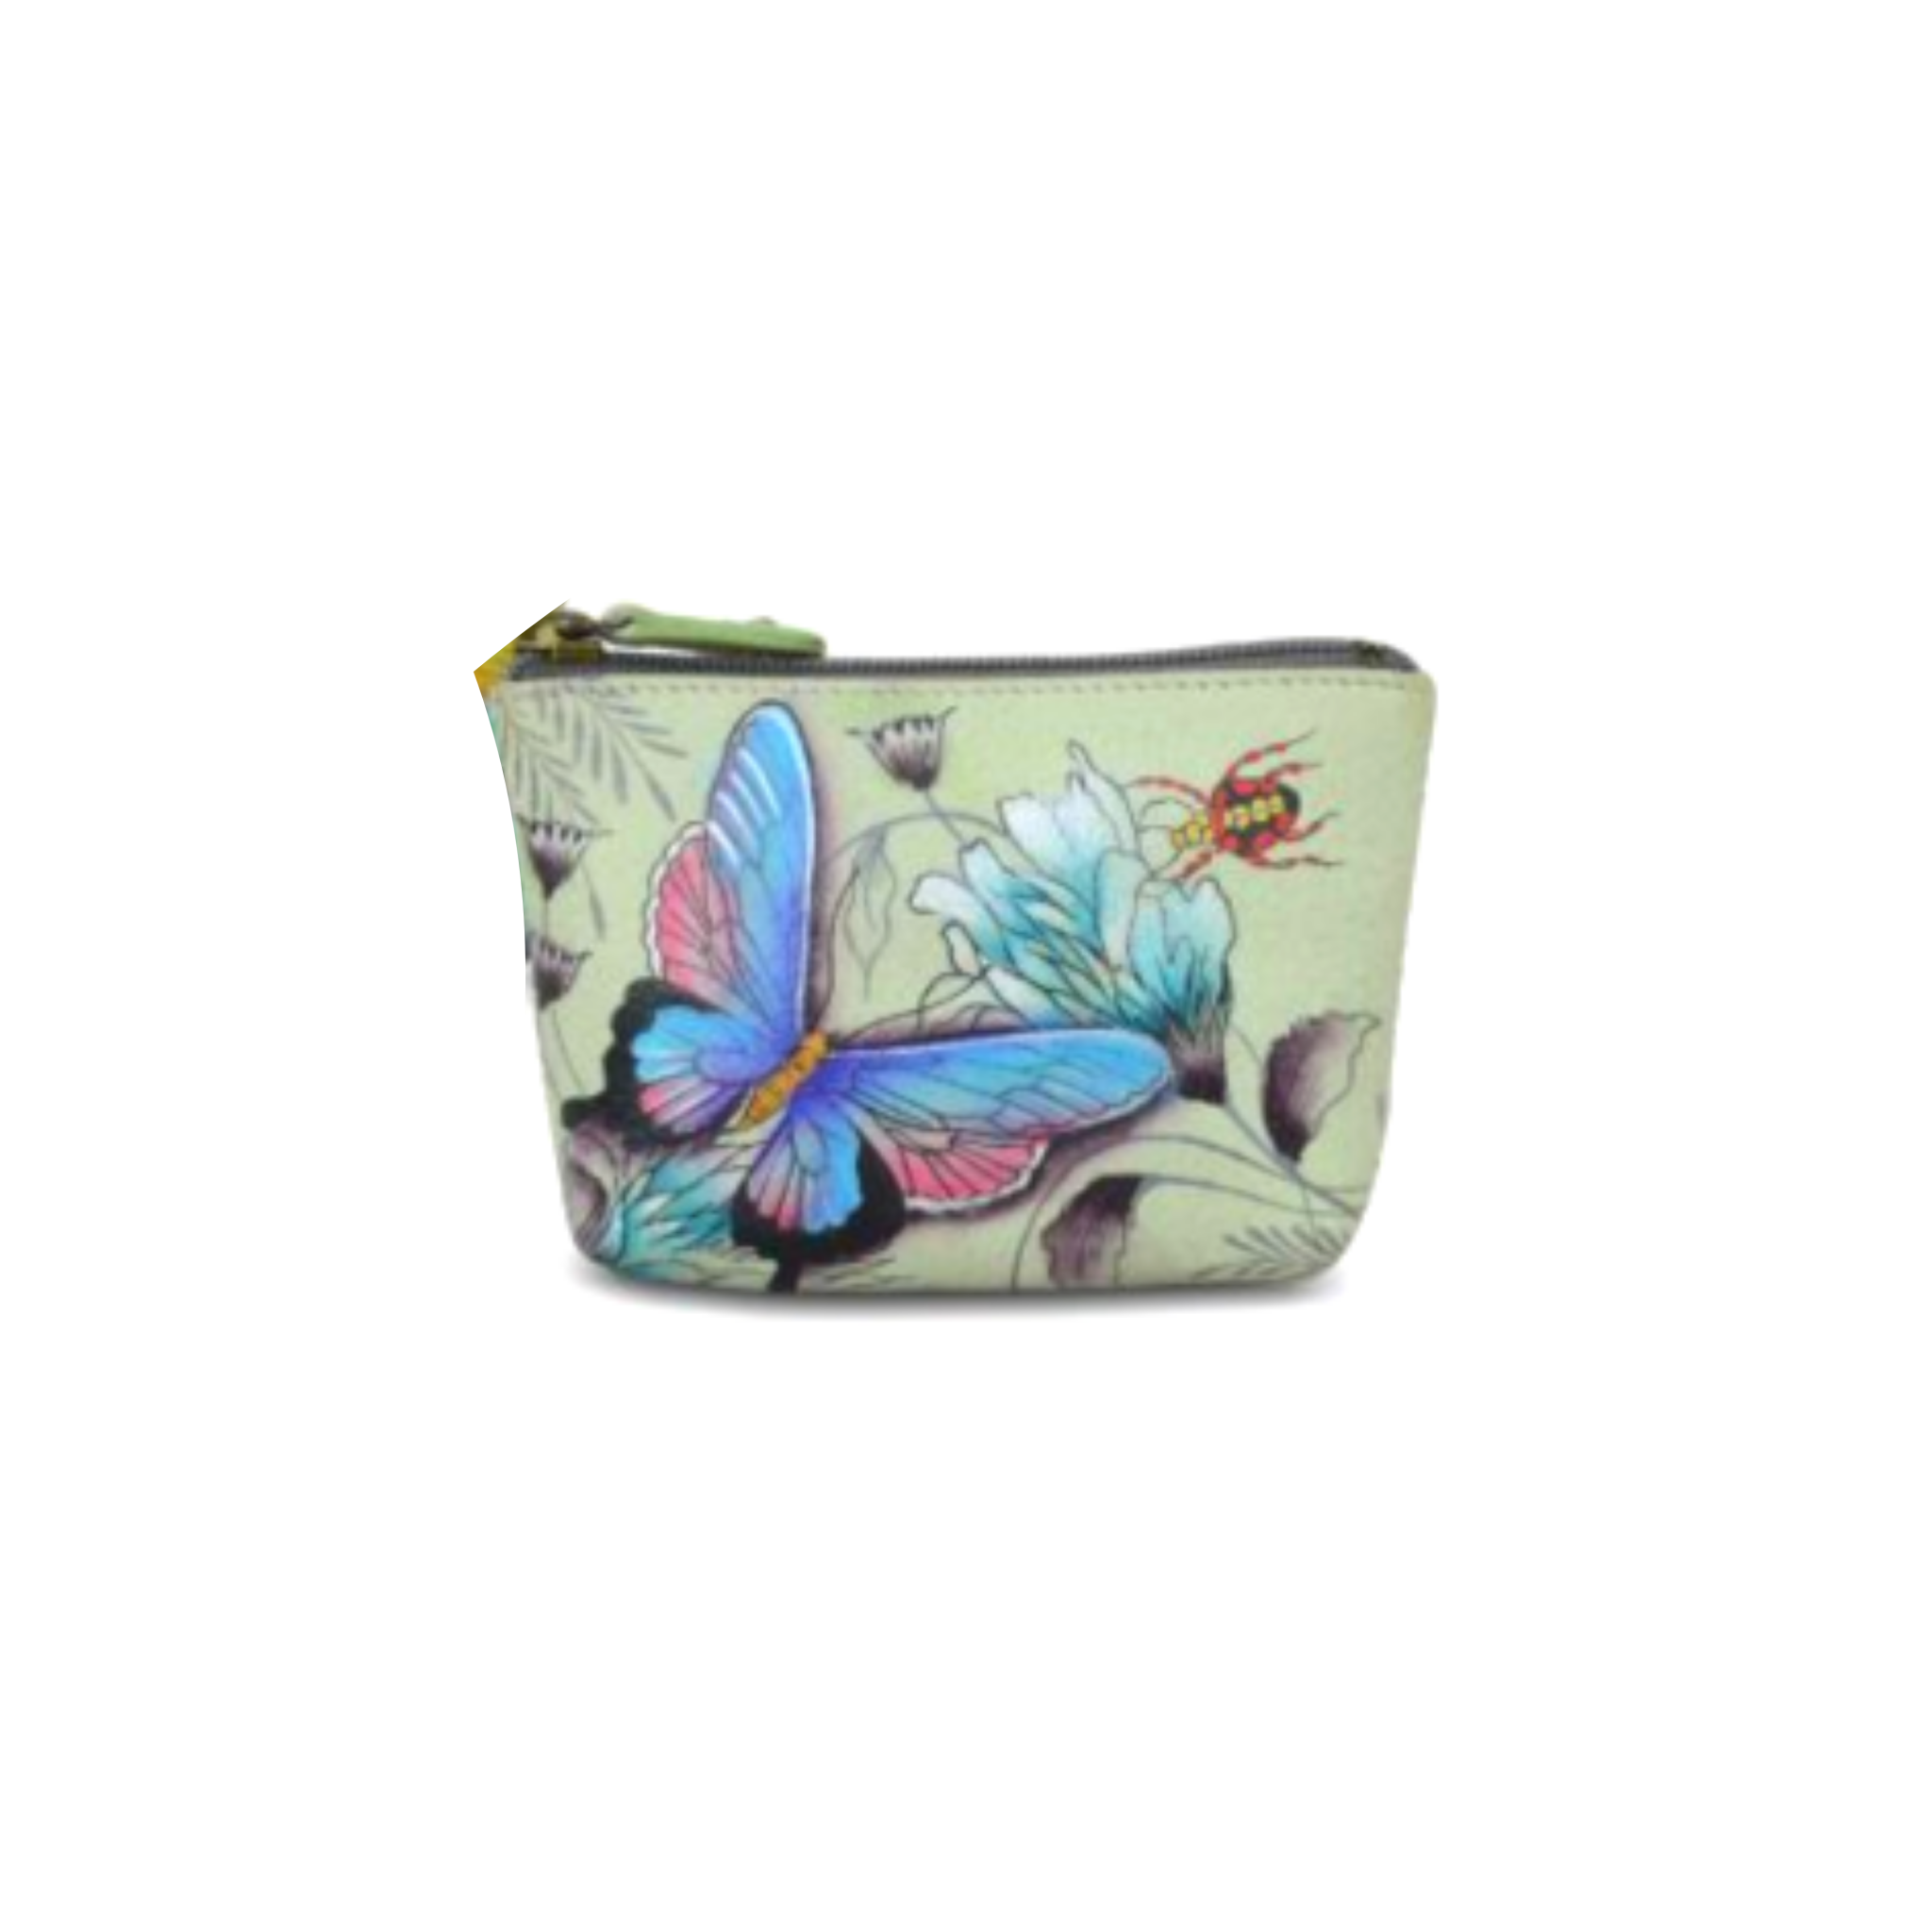 Anuschka small zip pouch 1031 wwg